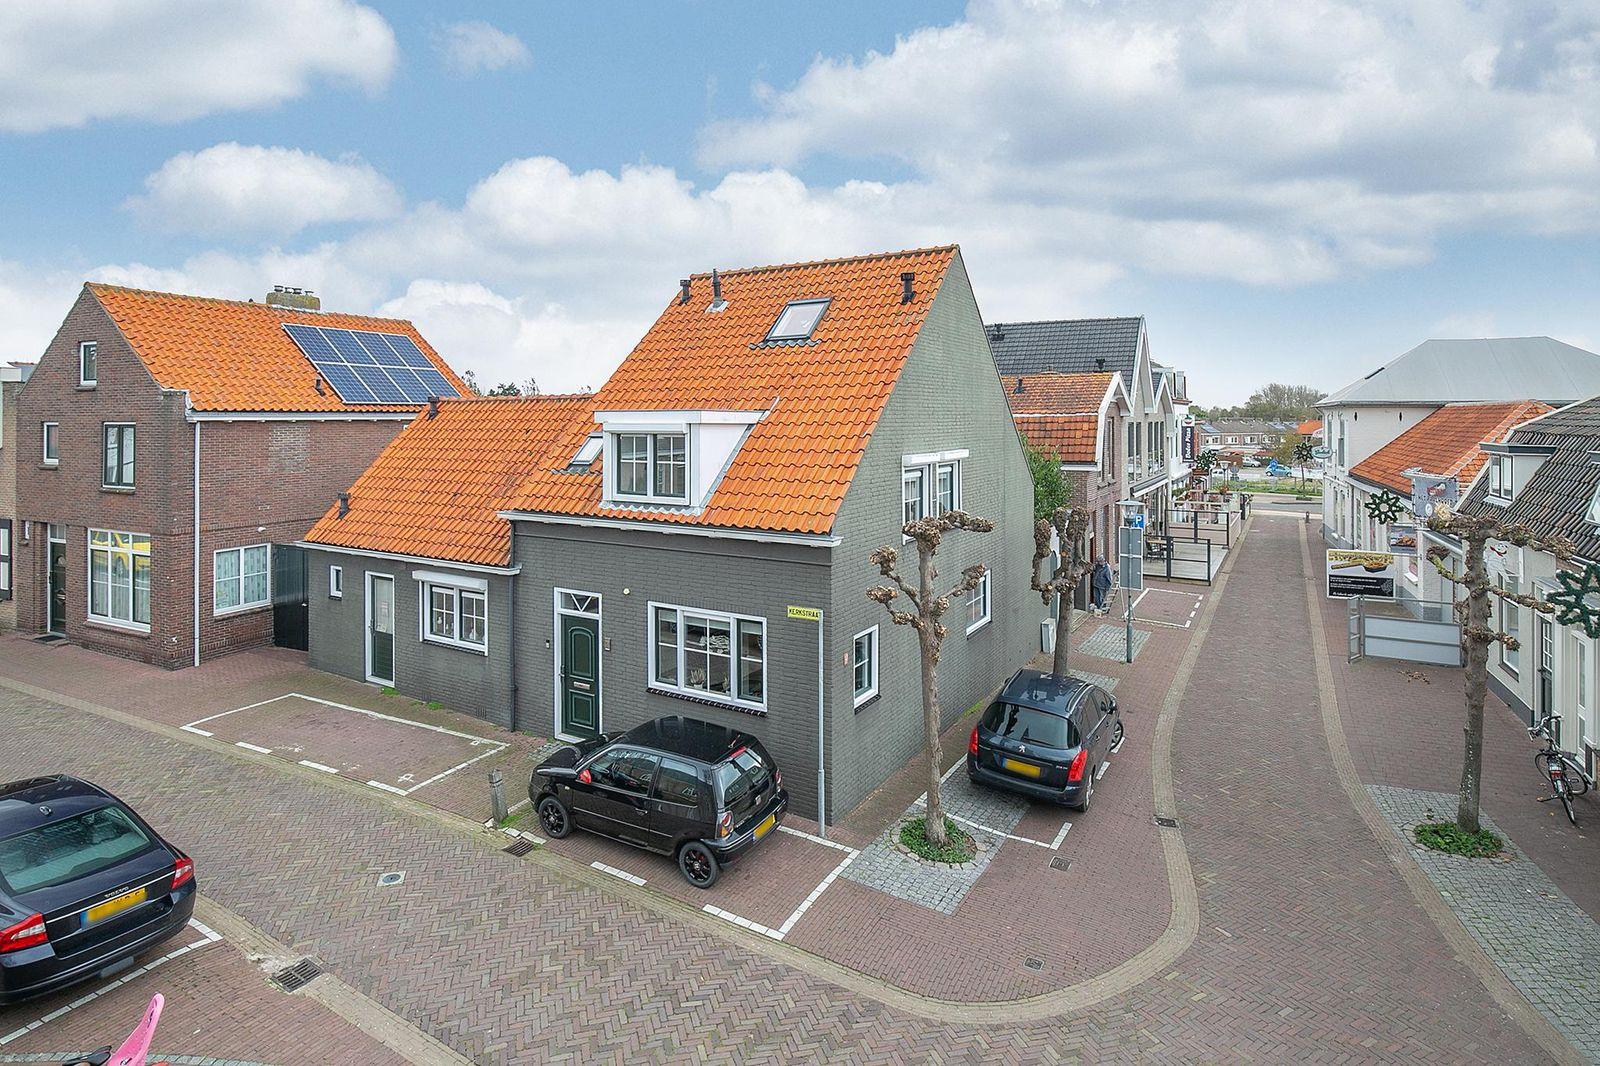 Kerkstraat 7, Domburg